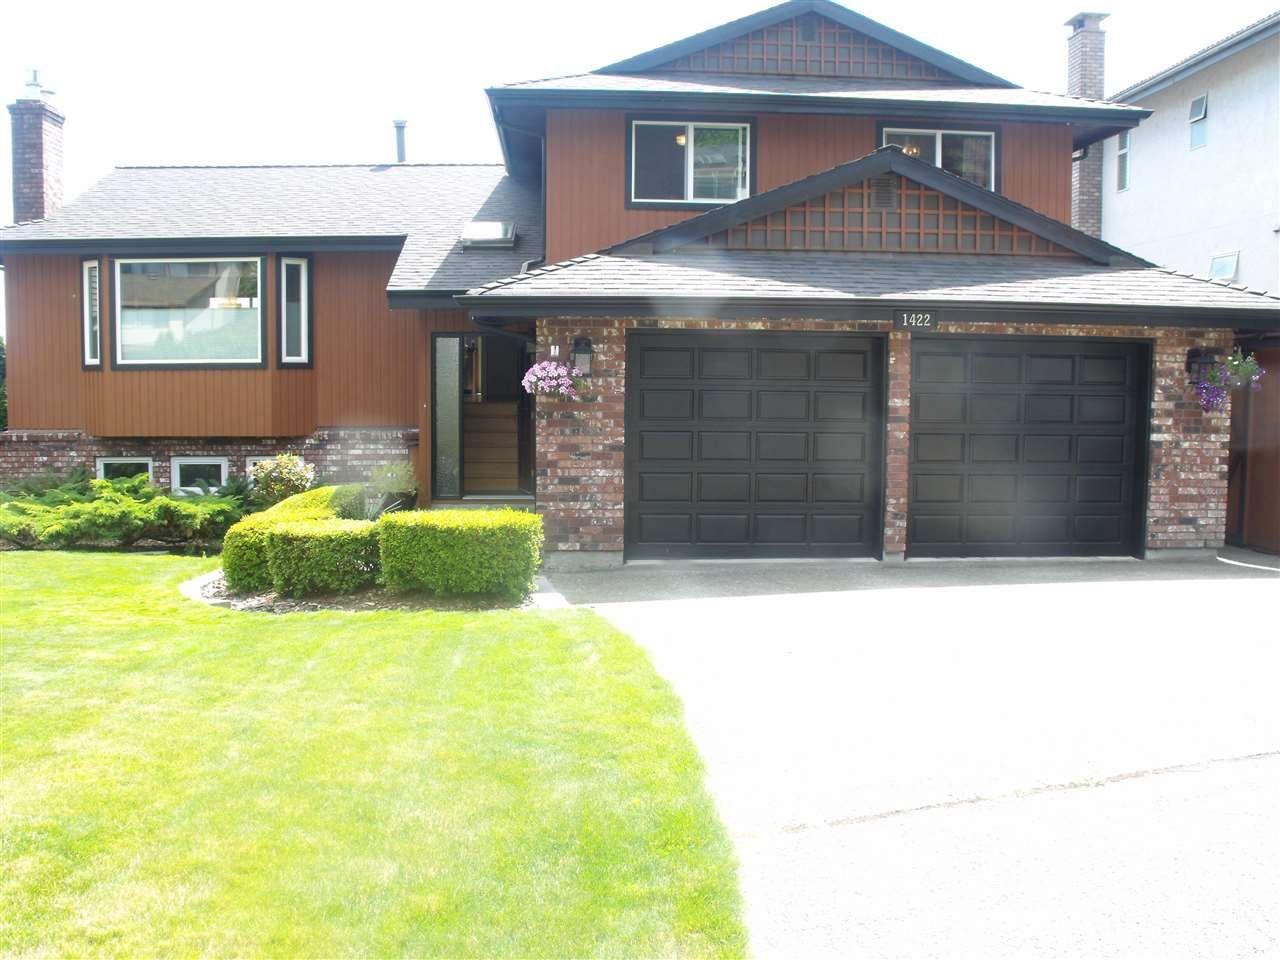 Main Photo: 1422 LANSDOWNE Drive in Coquitlam: Upper Eagle Ridge House for sale : MLS®# R2096768